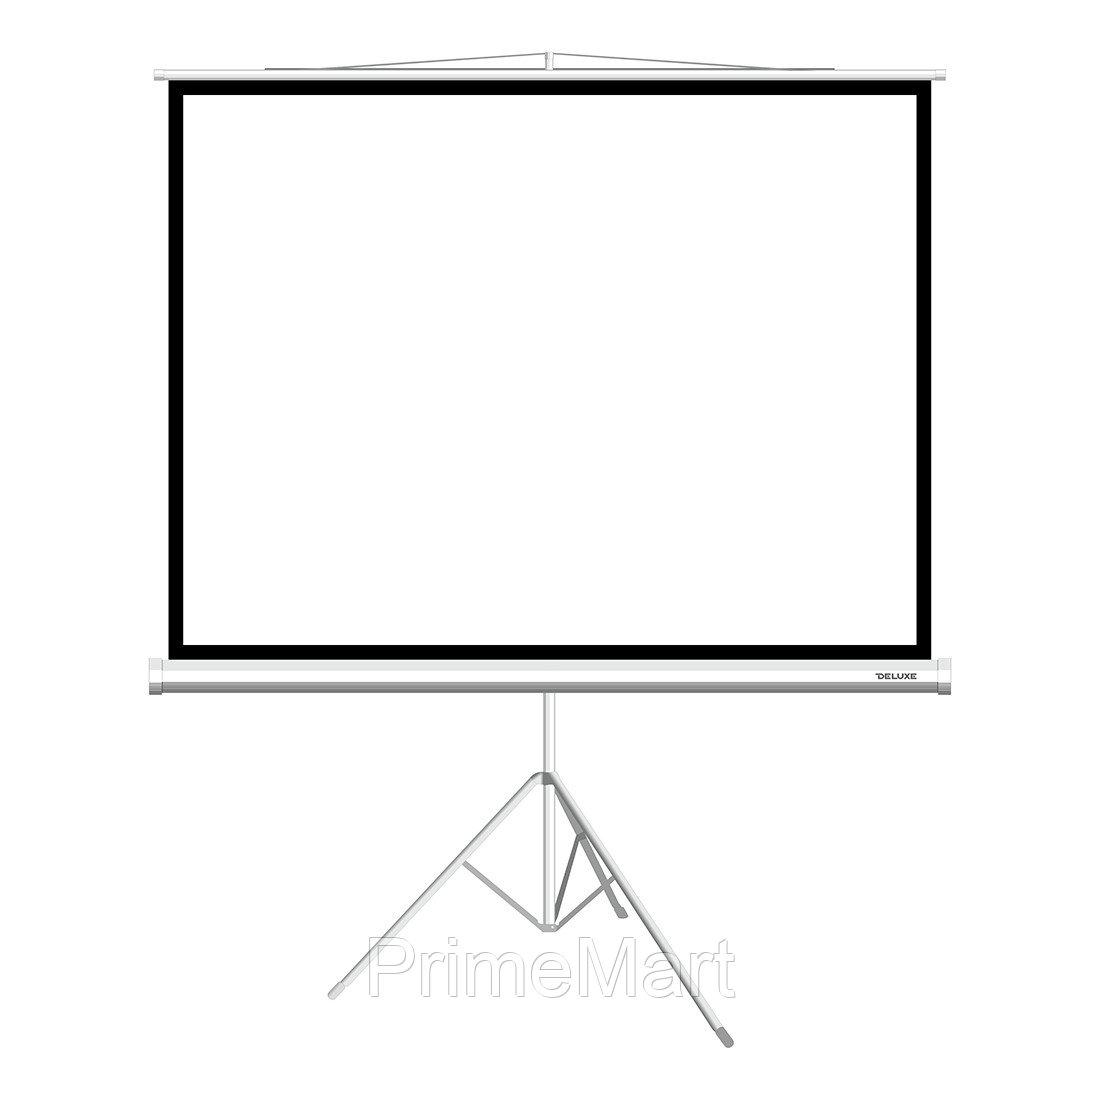 Экран на треноге, Deluxe, DLS-T153x116W, Рабочая поверхность 149х112 см., 4:3, Matt white, Белый